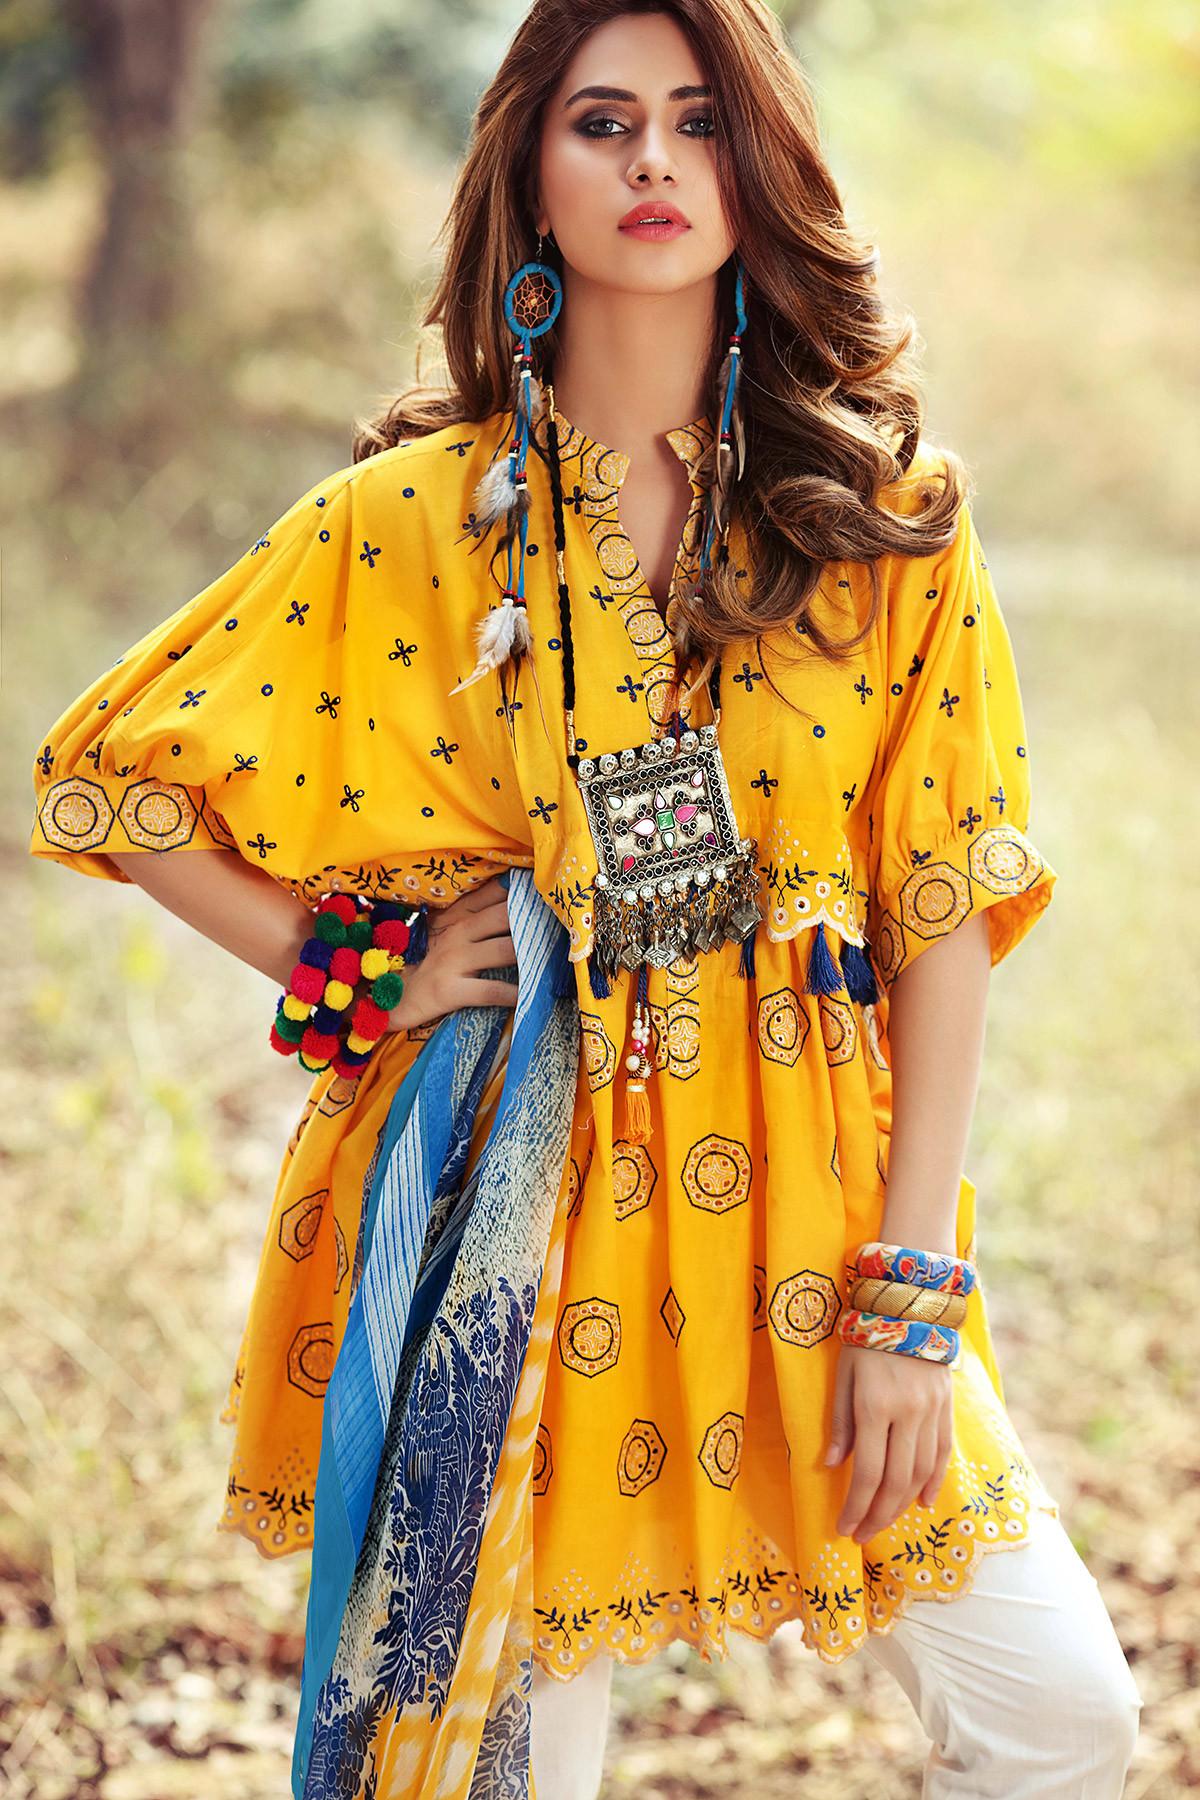 gypsy beautiful dress 2017 for girls